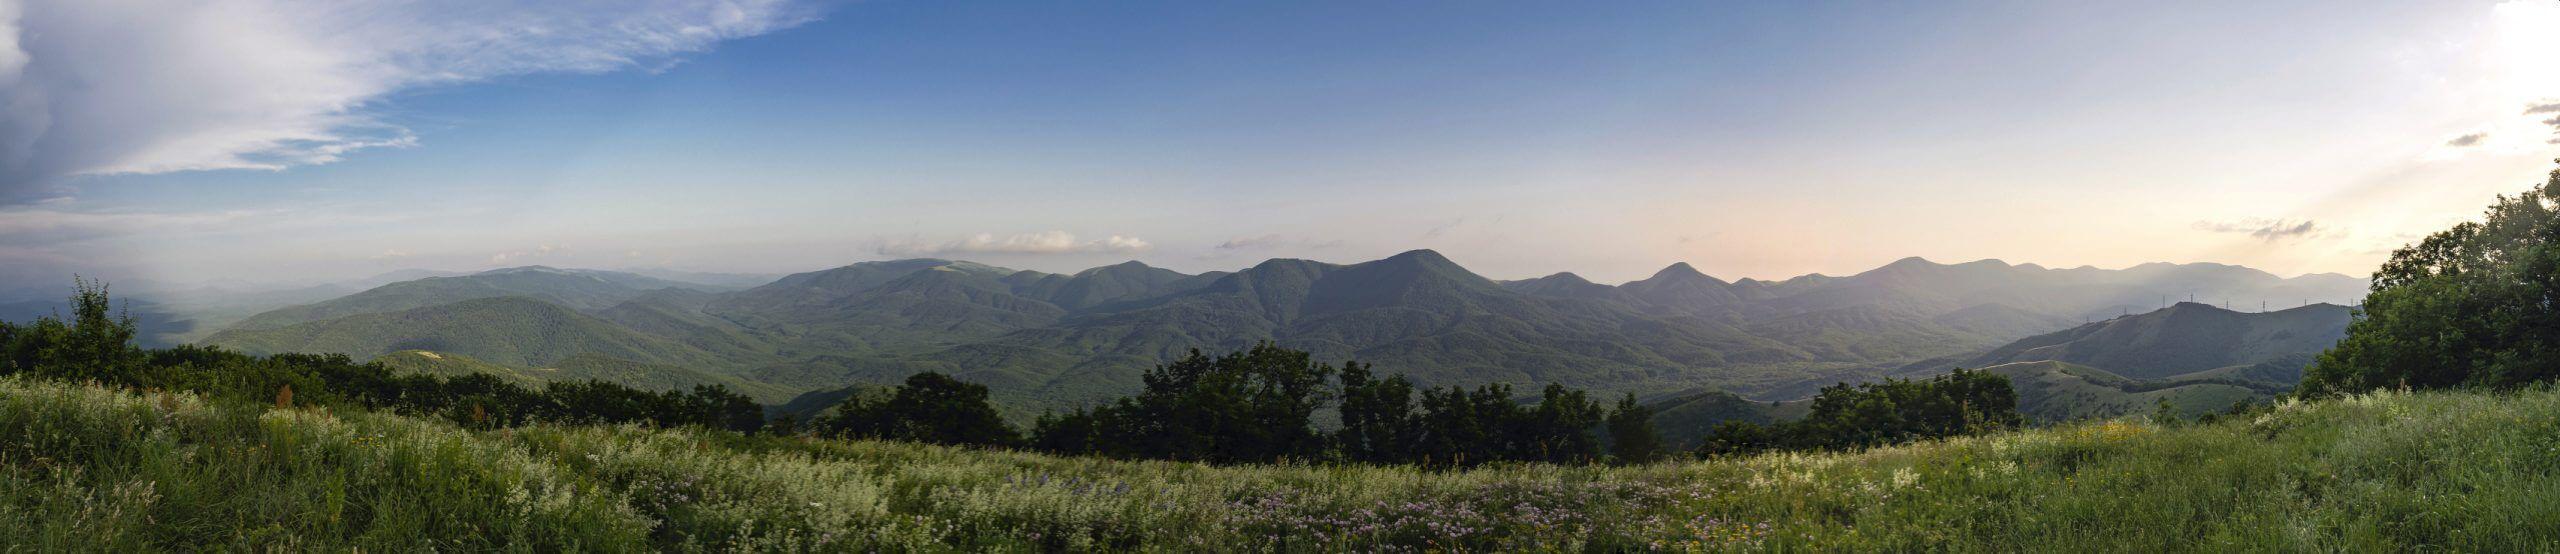 Панорама с горы Свинцовая